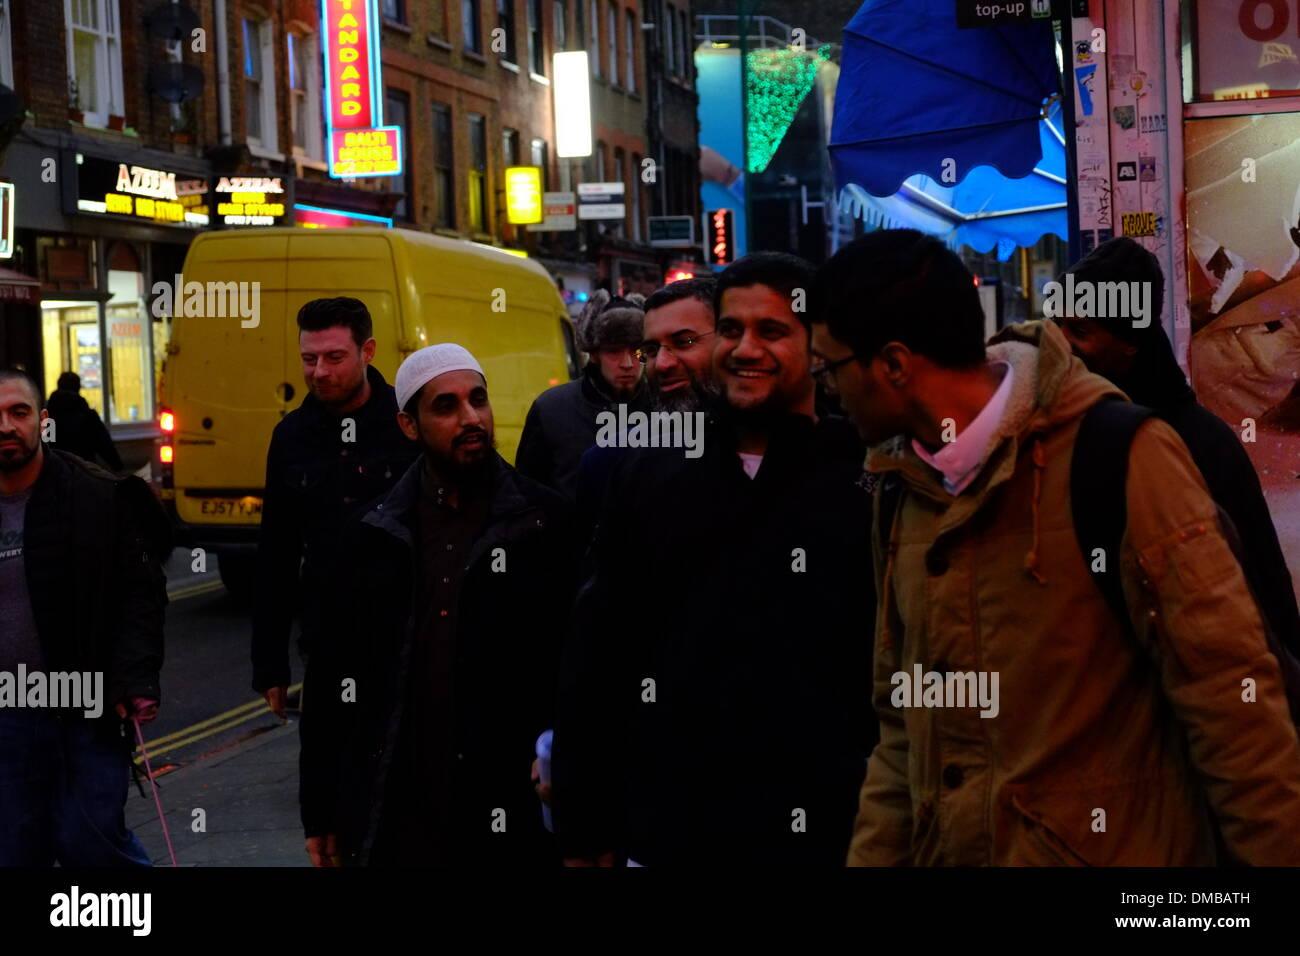 London, UK. 13th December 2013. Muslim extremist march calling for ban on alcohol, Brick Lane, London Credit:  Rachel Megawhat/Alamy Live News - Stock Image